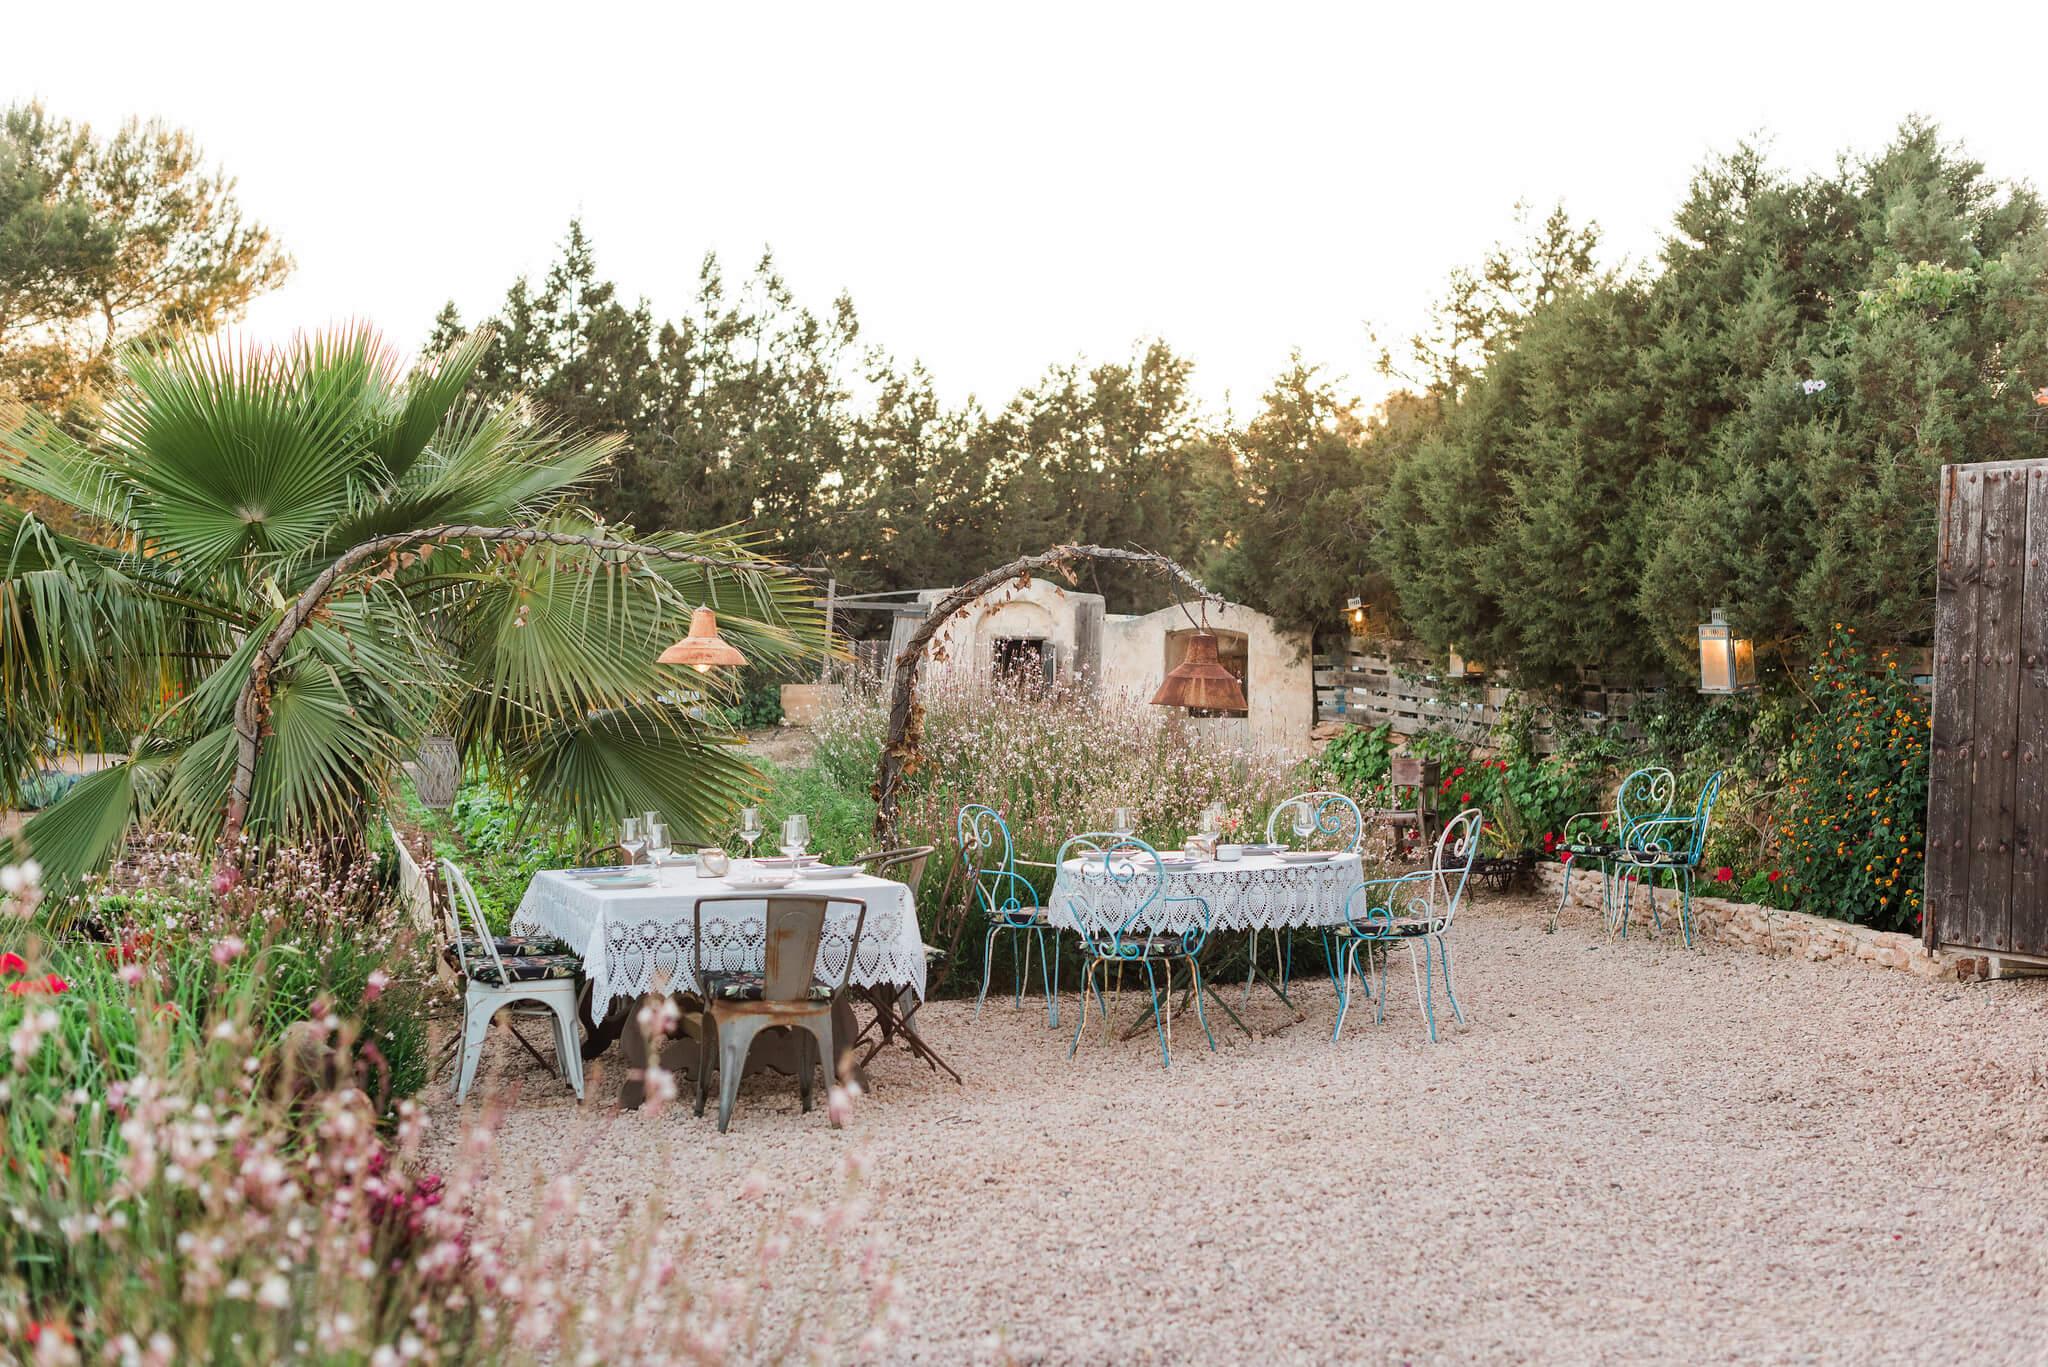 https://www.white-ibiza.com/wp-content/uploads/2020/03/formentera-restaurants-a-mi-manera-2020-02.jpg